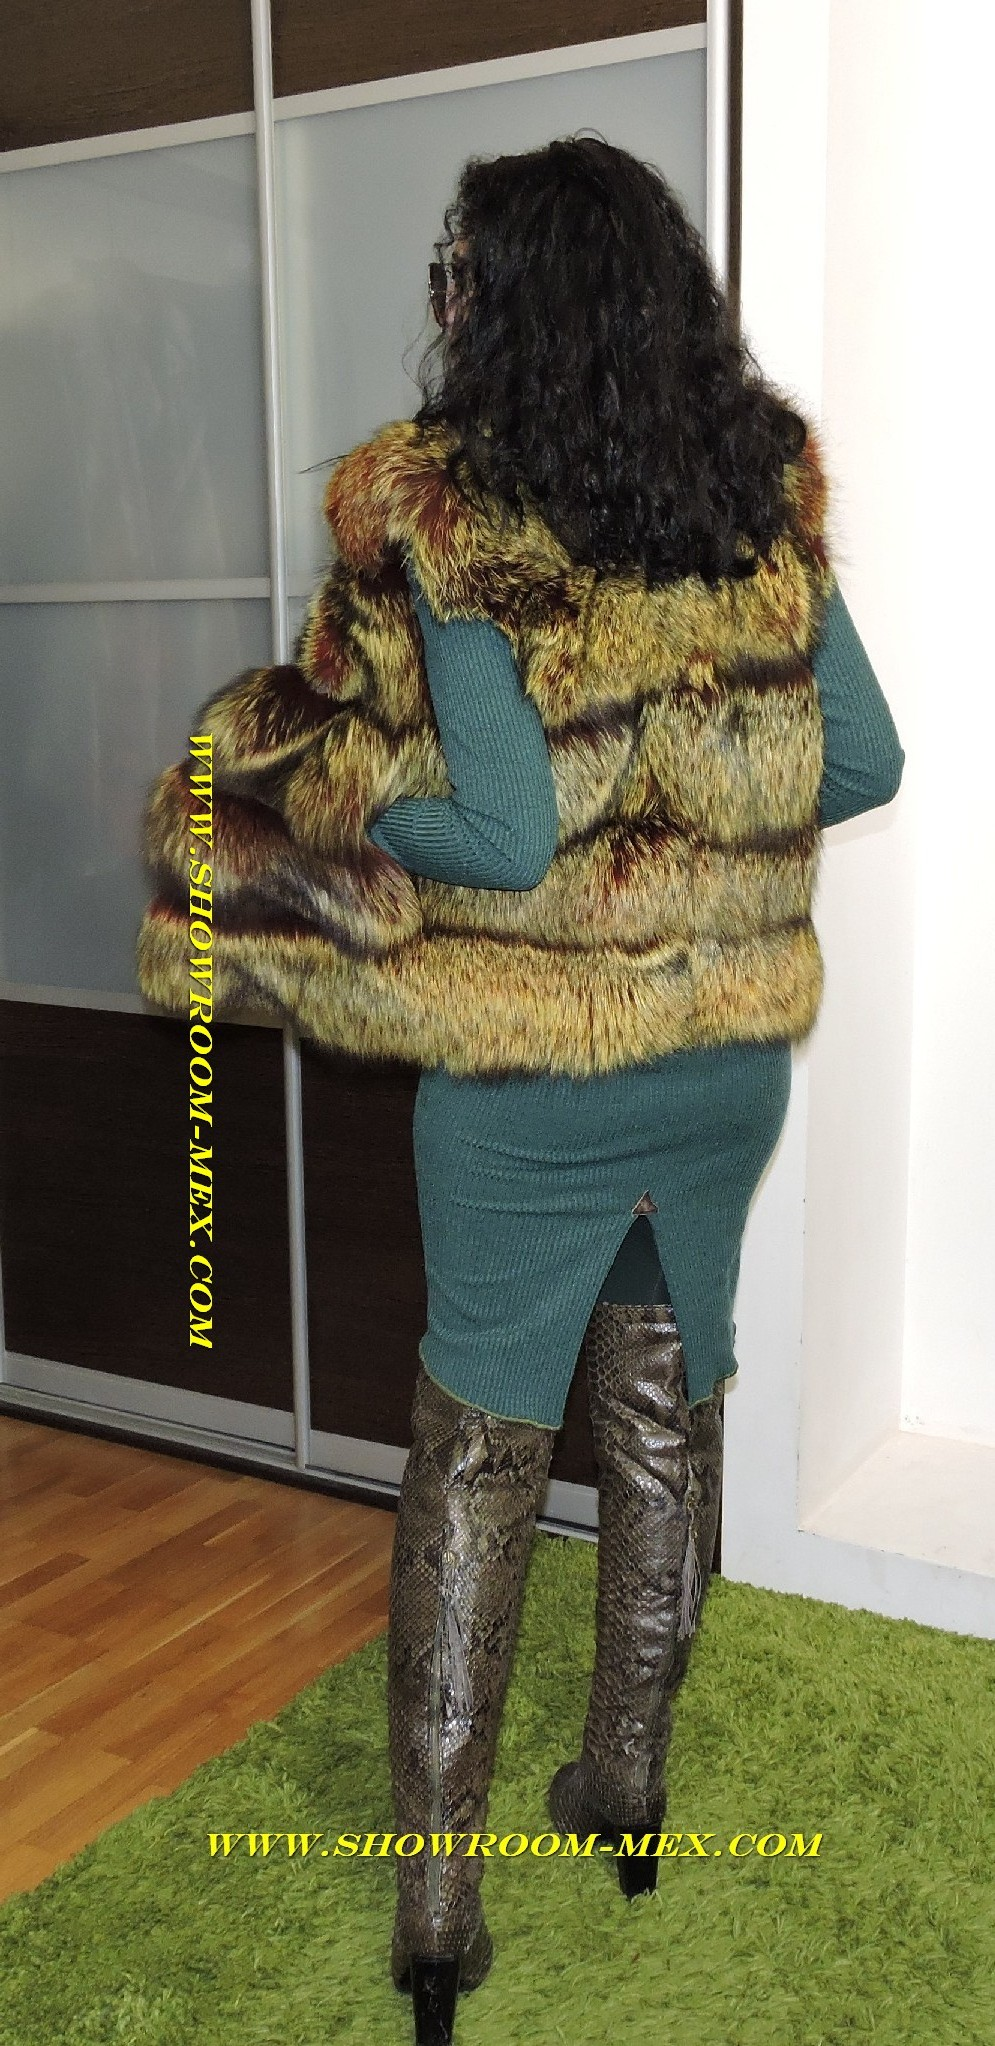 www.showroom-mex.com жилетка из лисы попечечка люкс 2017 s size 13.jpg